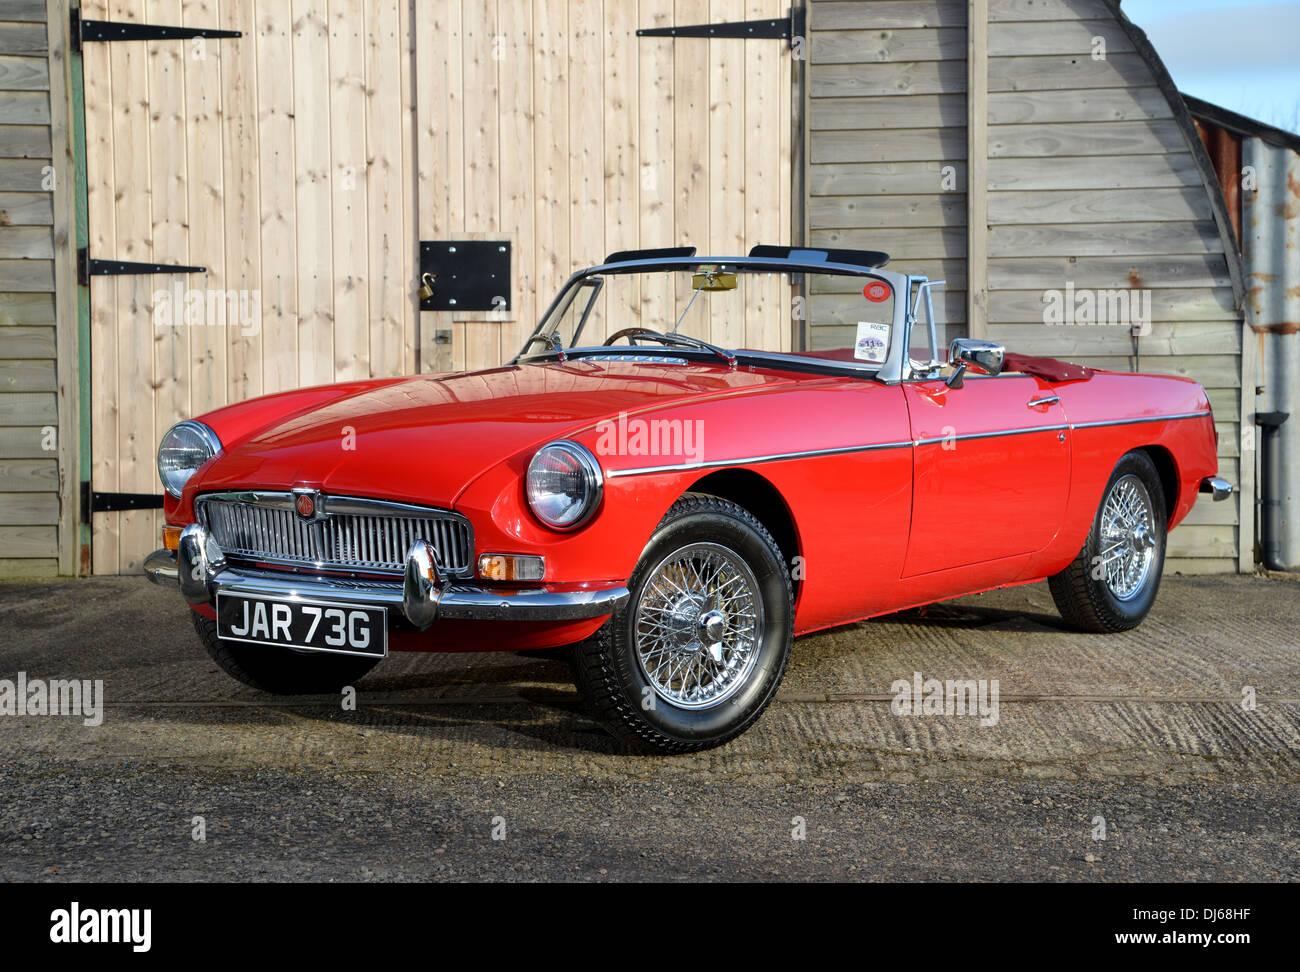 Red chrome bumper MGB convertible classic British sports car - Stock Image